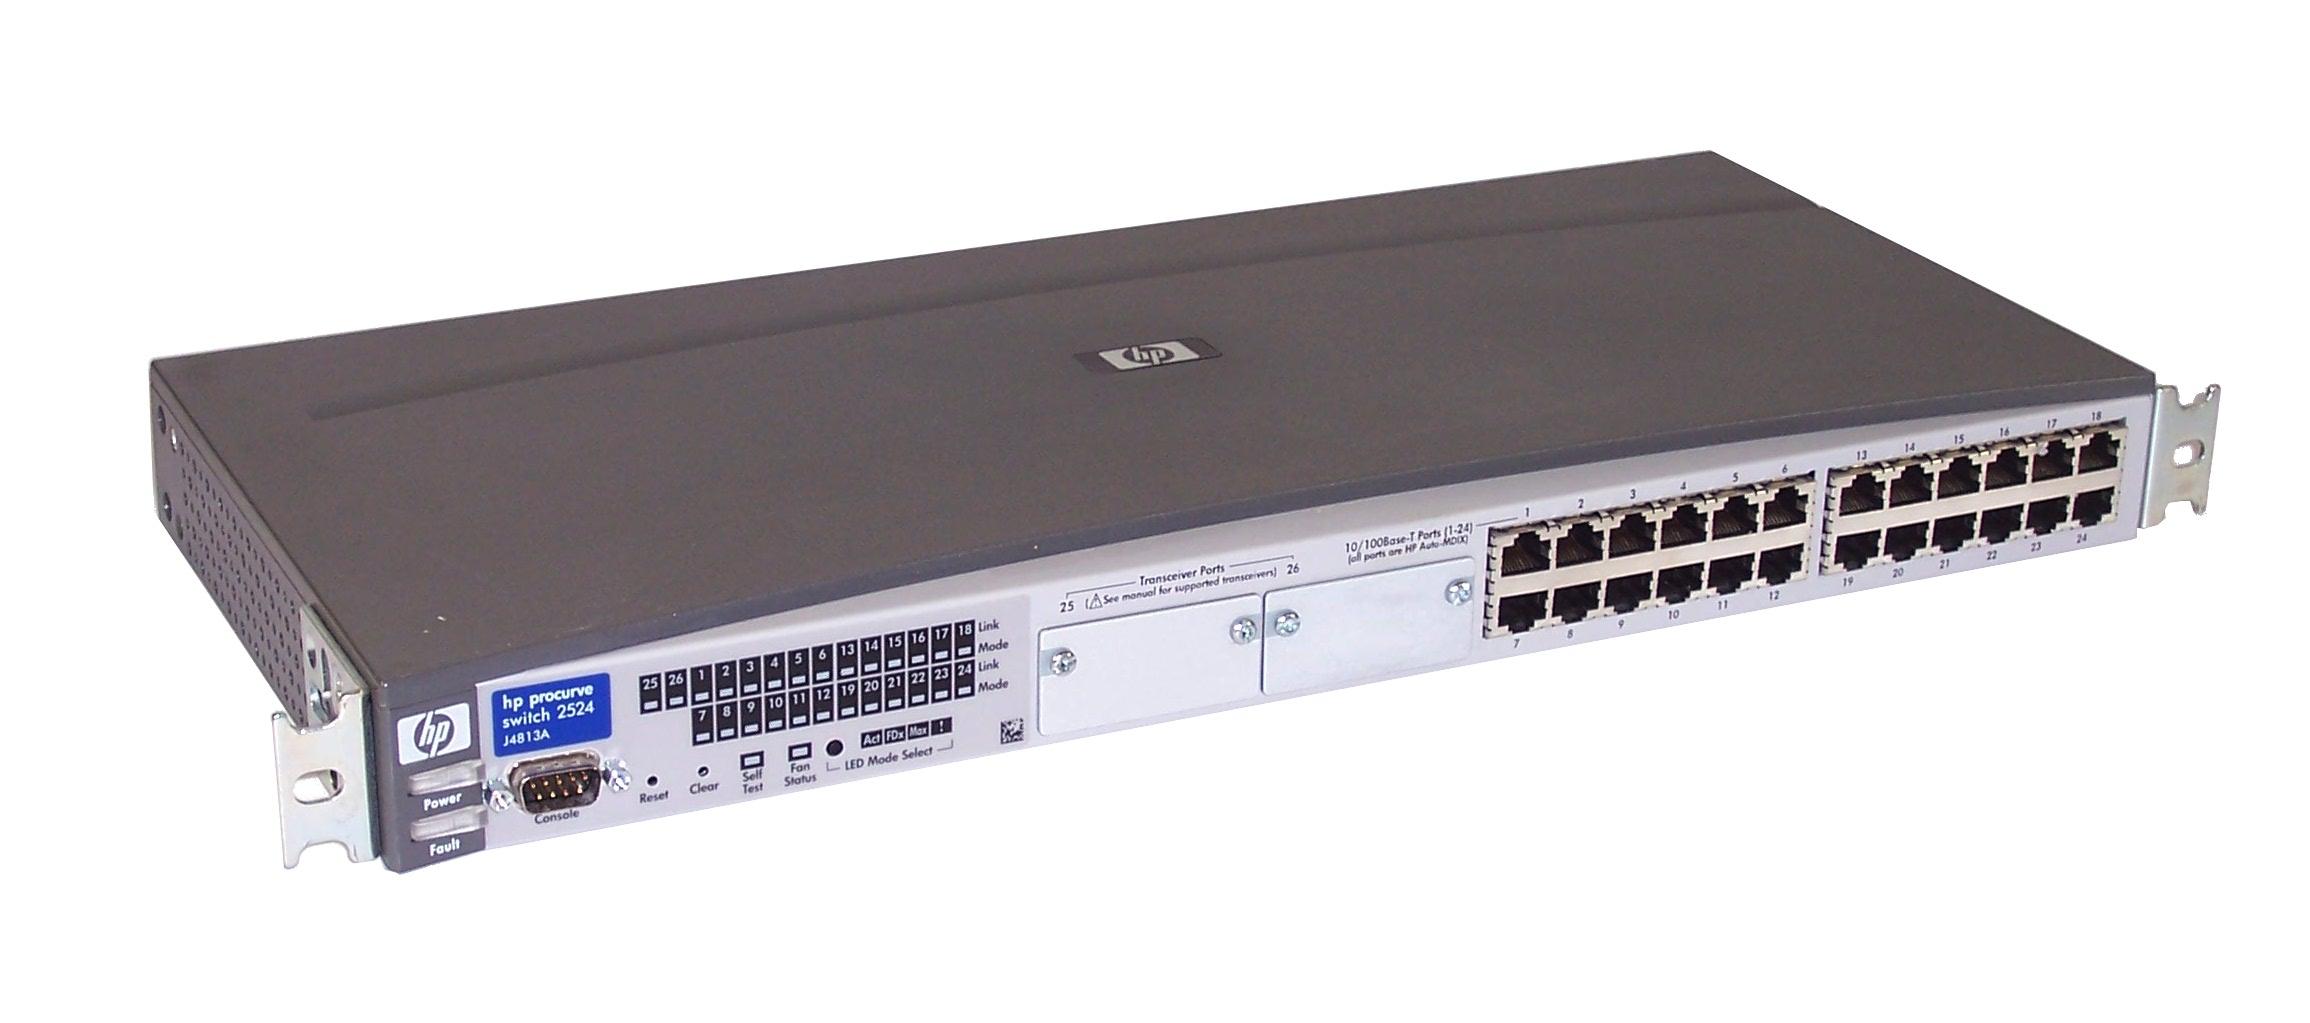 hp j4813a procurve 2524 24 10 100base t port switch with rack mount rh ebay co uk procurve switch 2524 manual hp procurve 2524 manual pdf